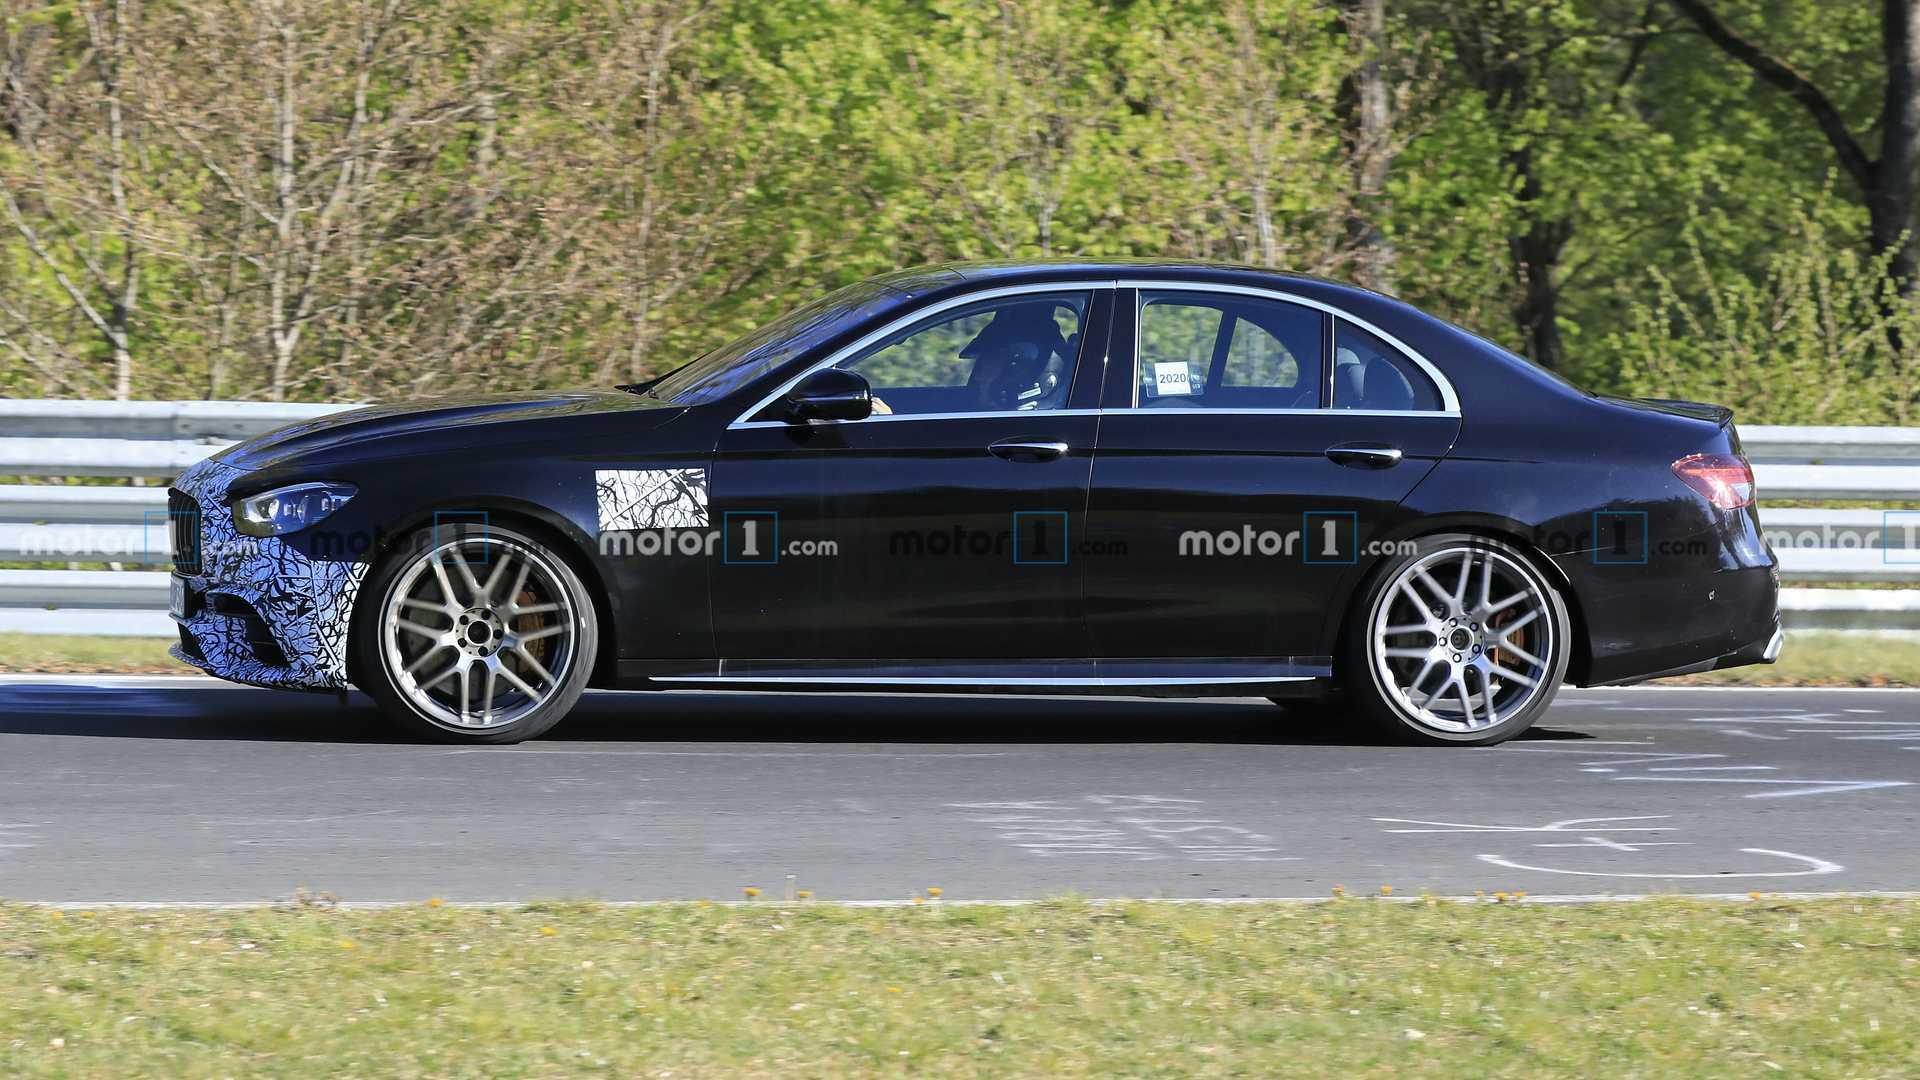 2020 - [Mercedes-Benz] Classe E restylée  - Page 6 2021-mercedes-amg-e63-sedan-facelift-spy-photo